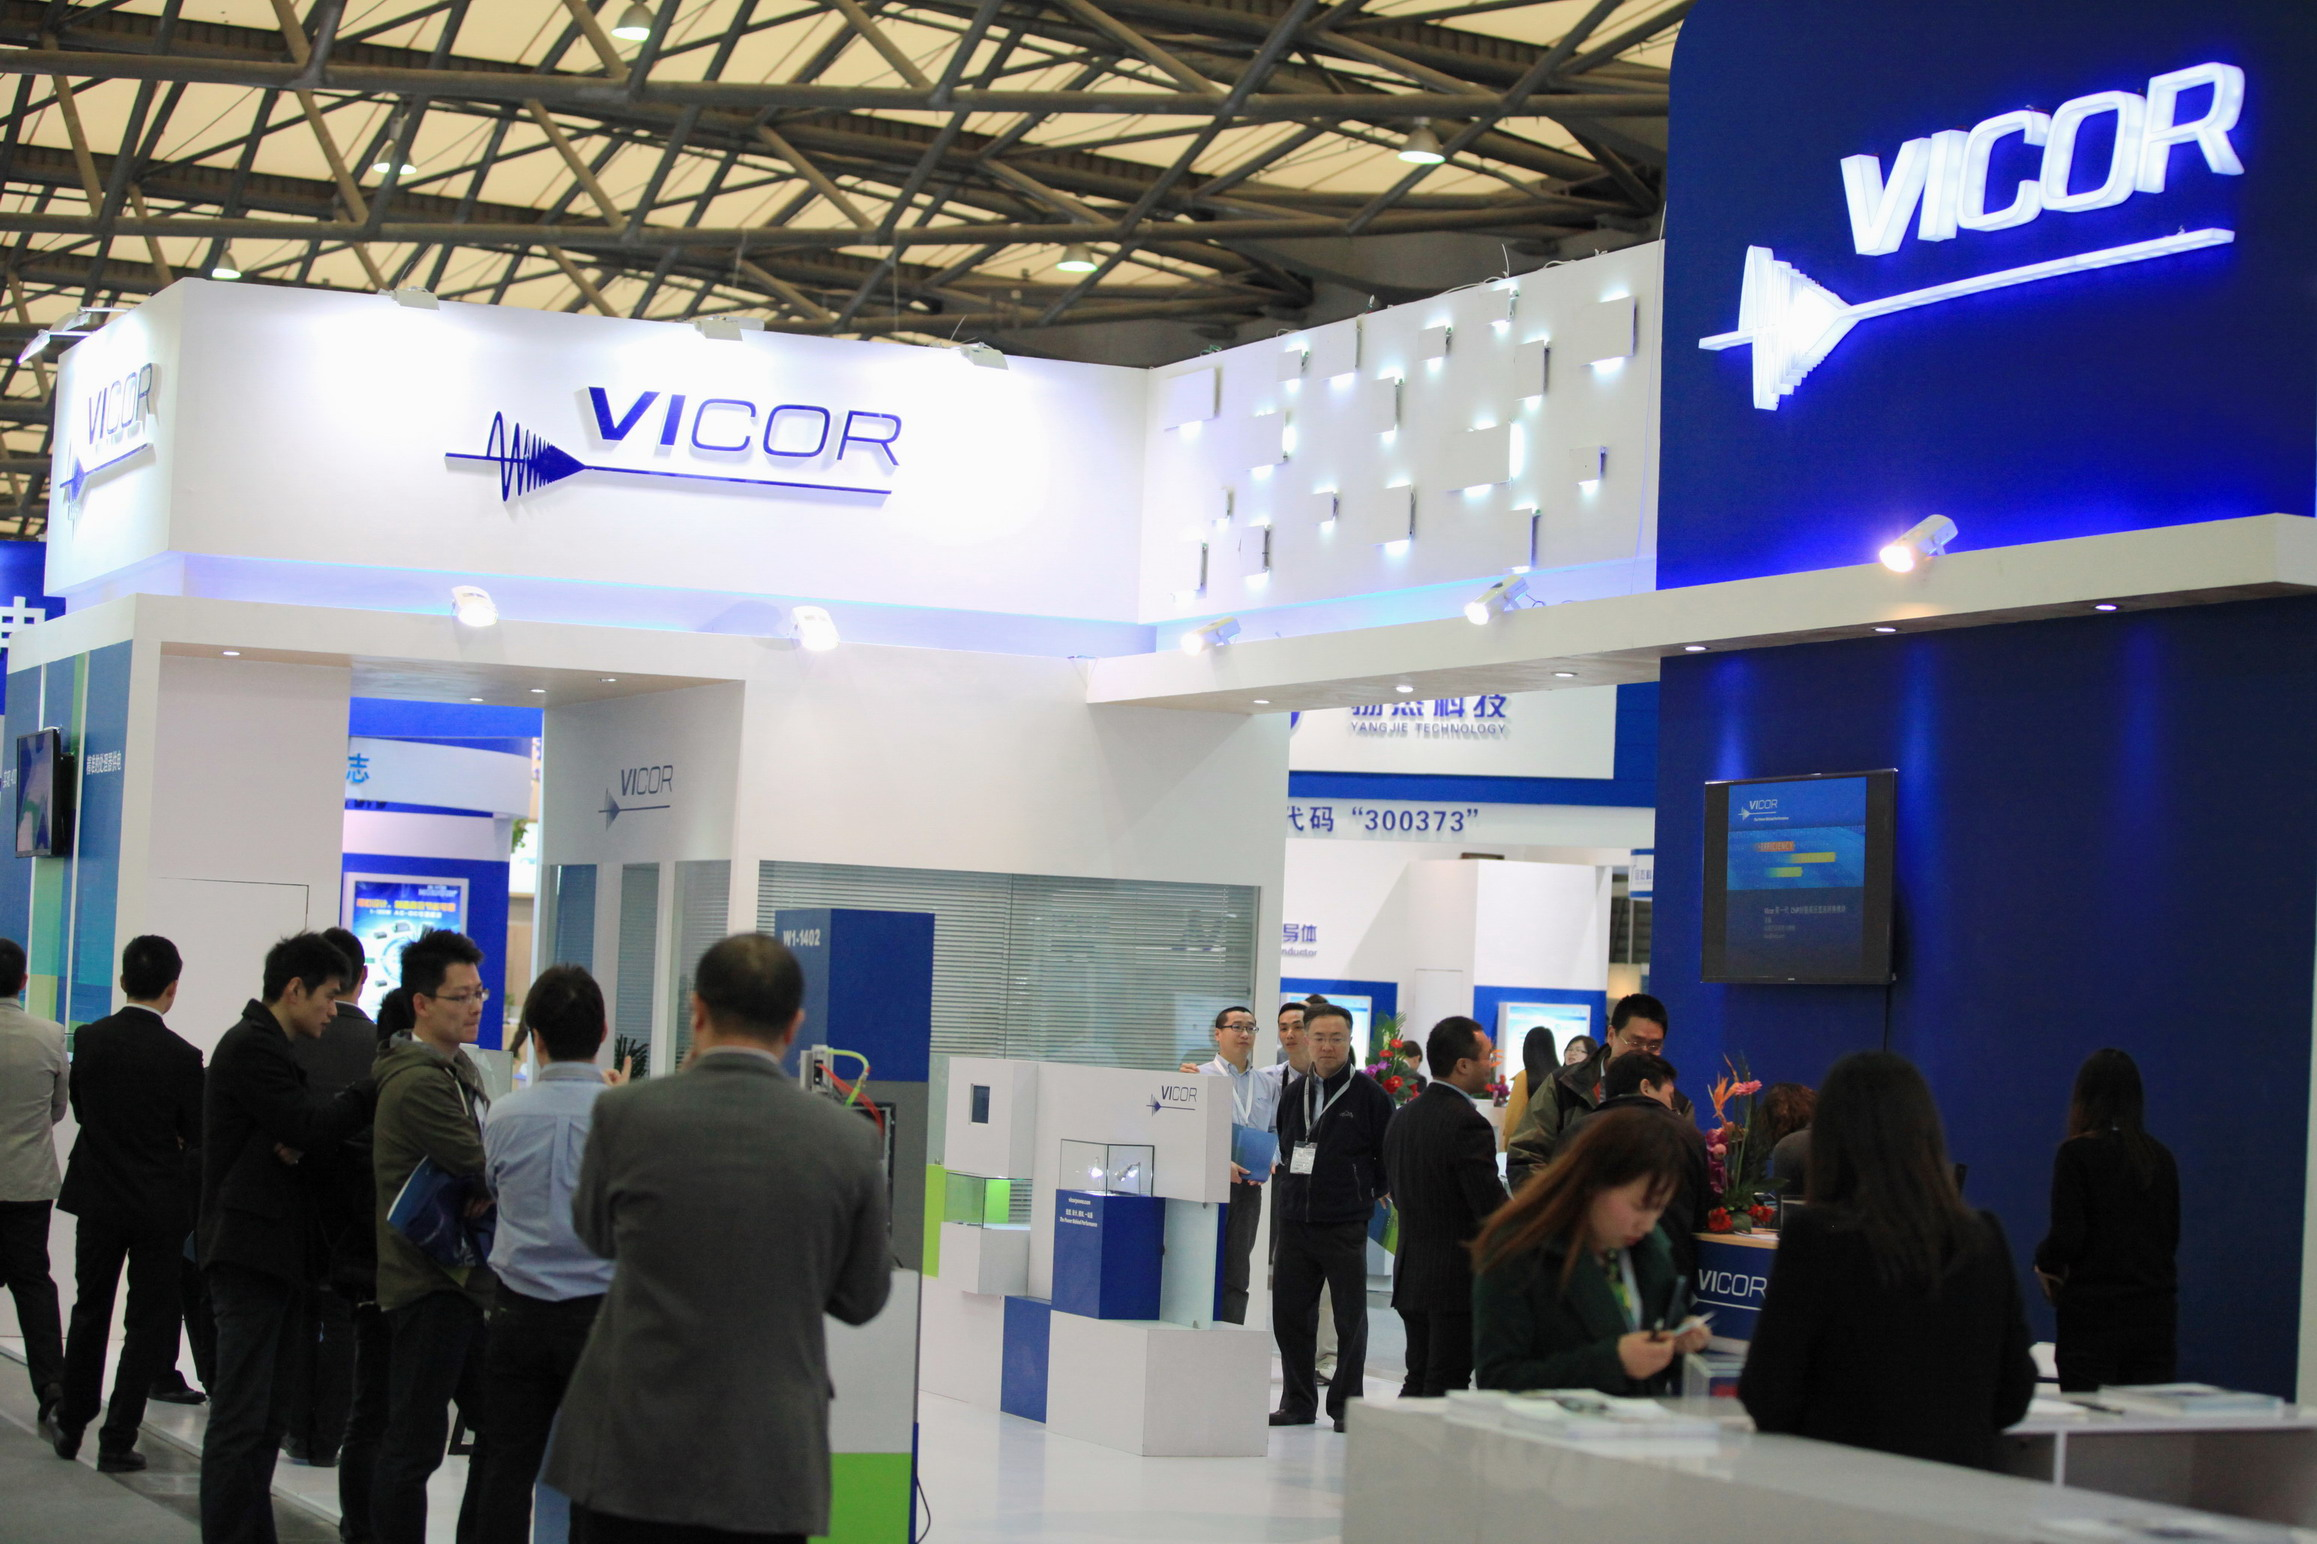 Vicor 主推48V供电迎接数据中心电源挑战